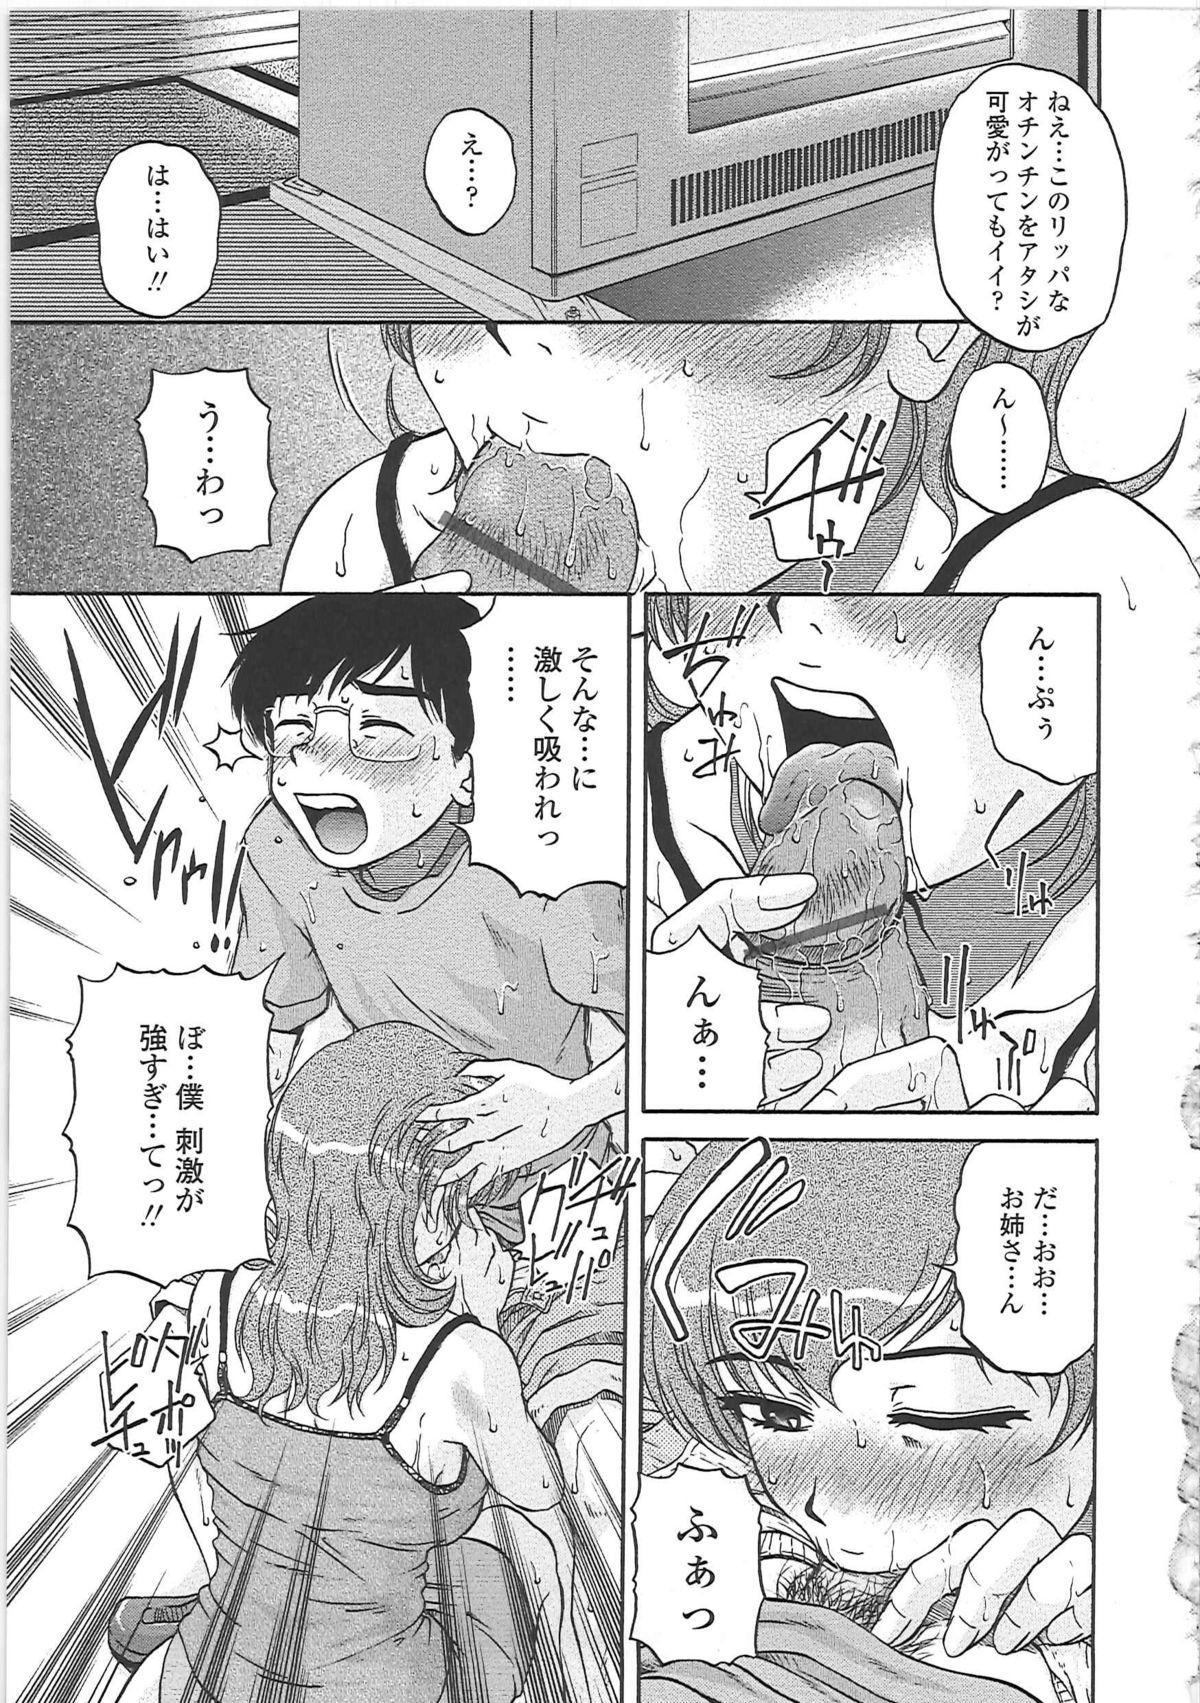 Nikuzuma Tsuushin - Erotic Wife Communication 153